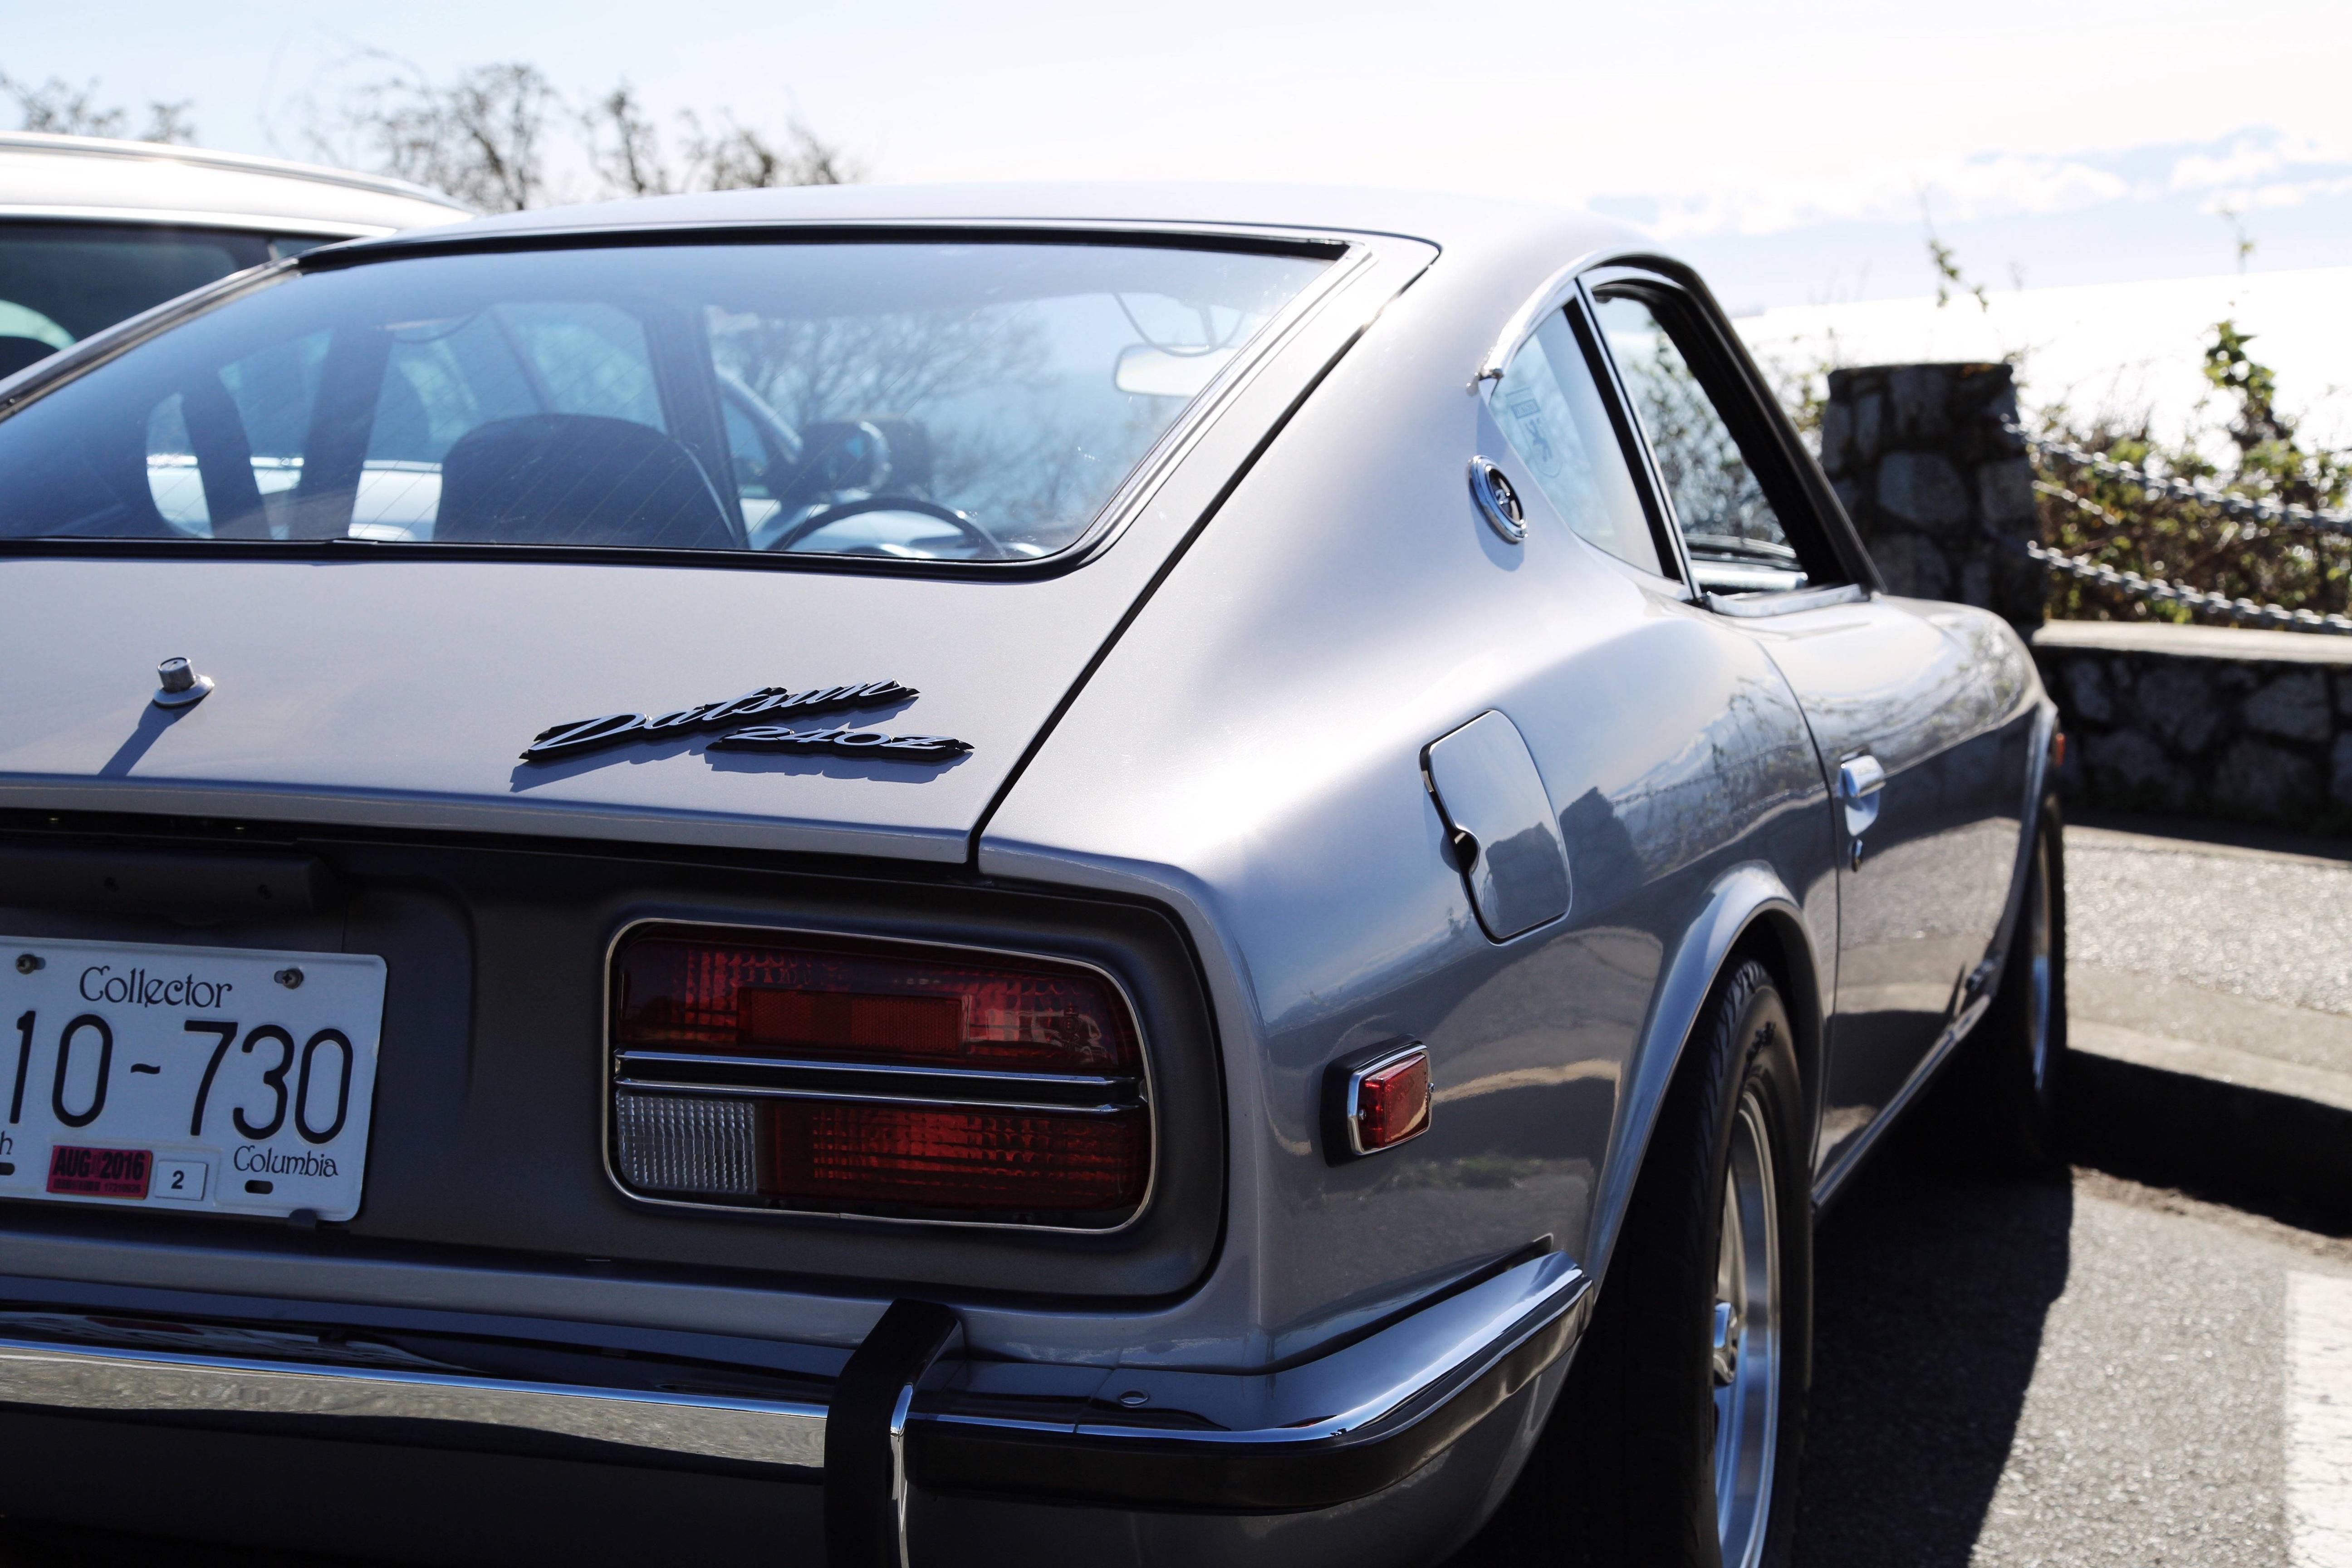 Rear End Of A Datsun 240z HD Wallpaper From Gallsourcecom HD Car